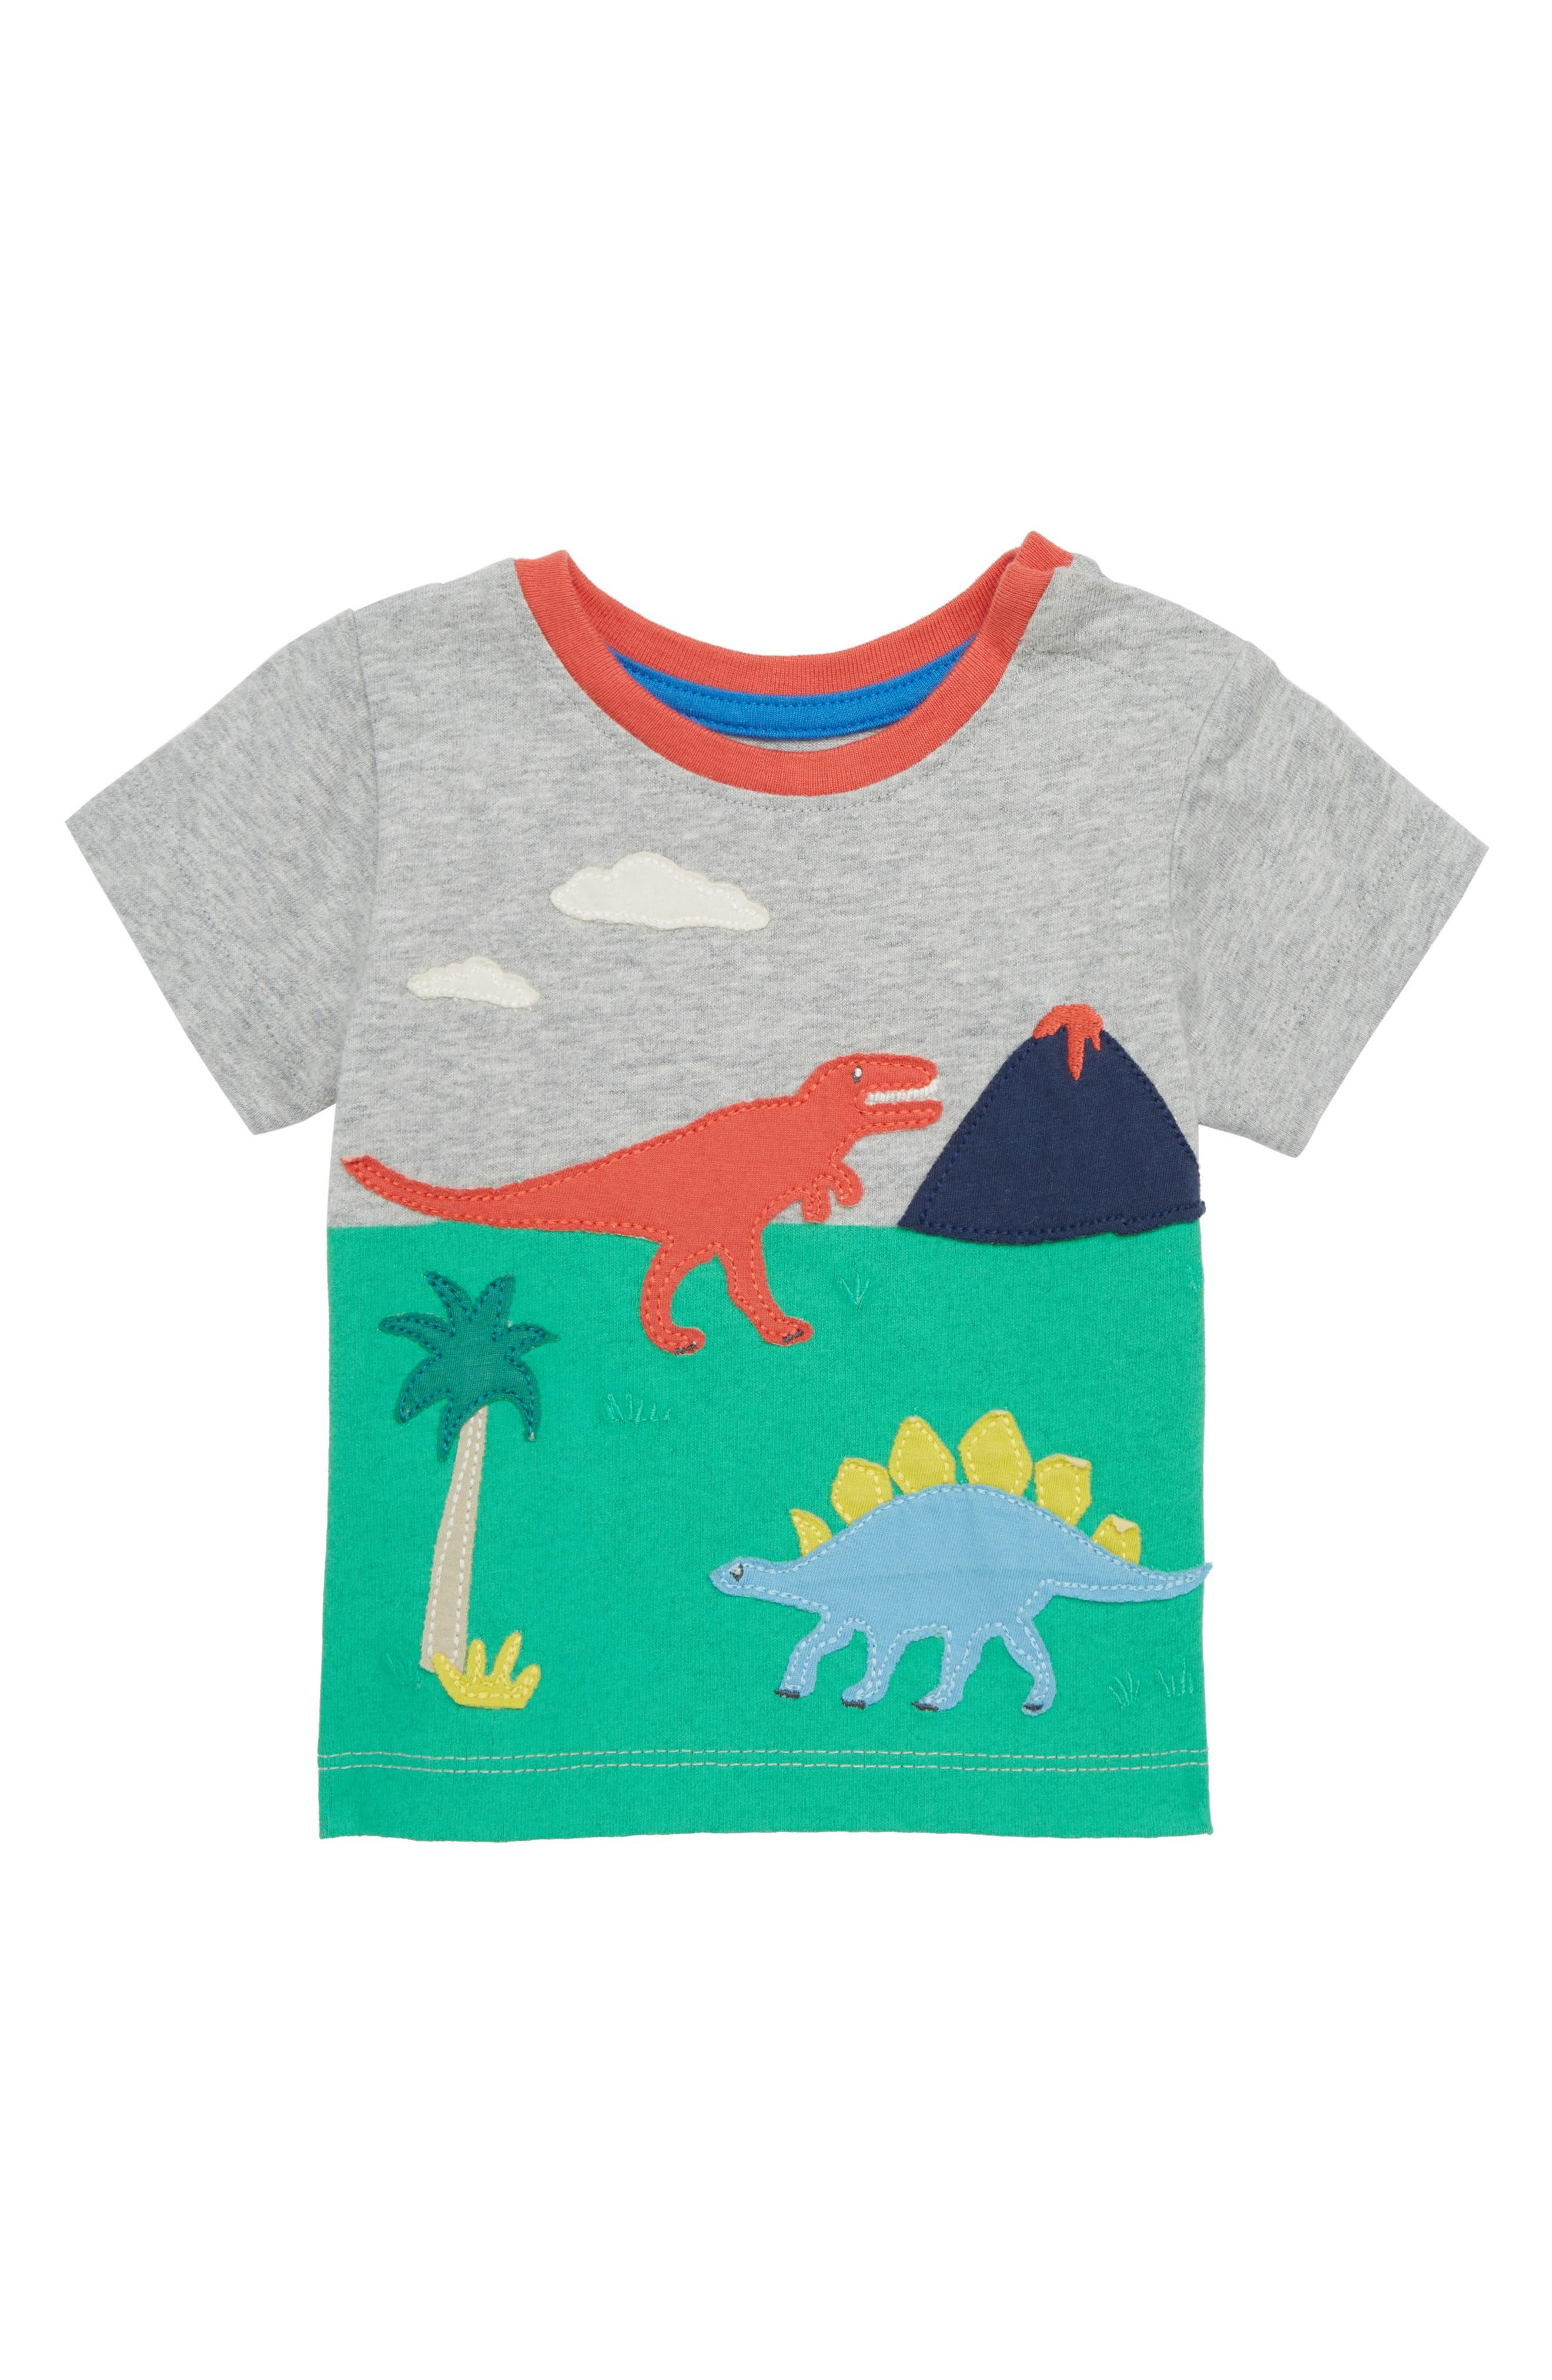 Animal Explorer T-Shirt,                         Main,                         color, Grey Marl